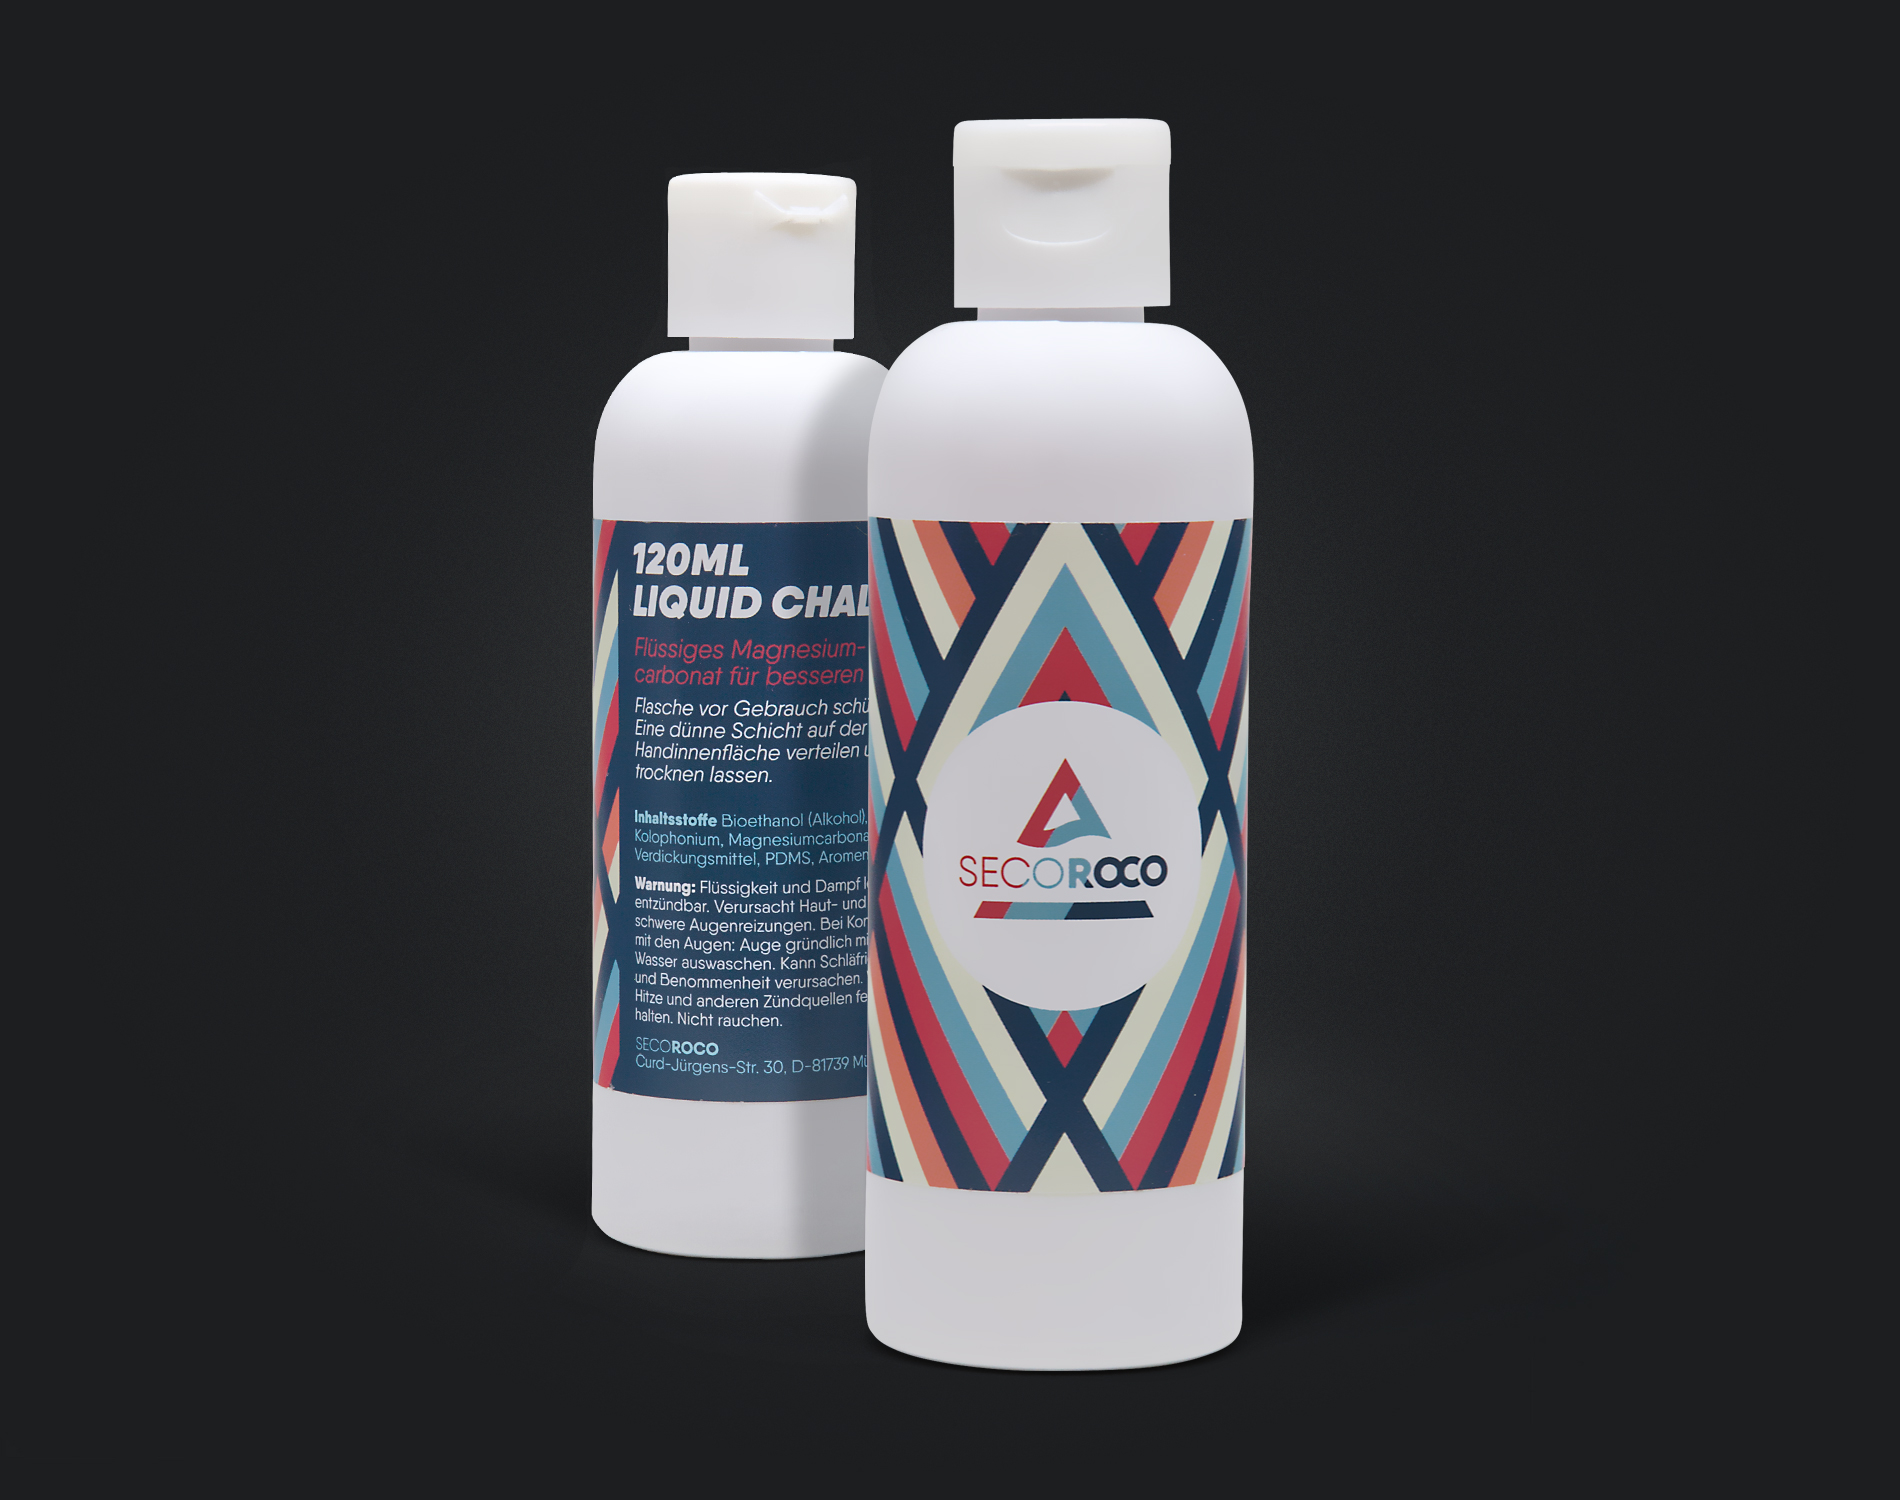 Liquid Chalk 120ml